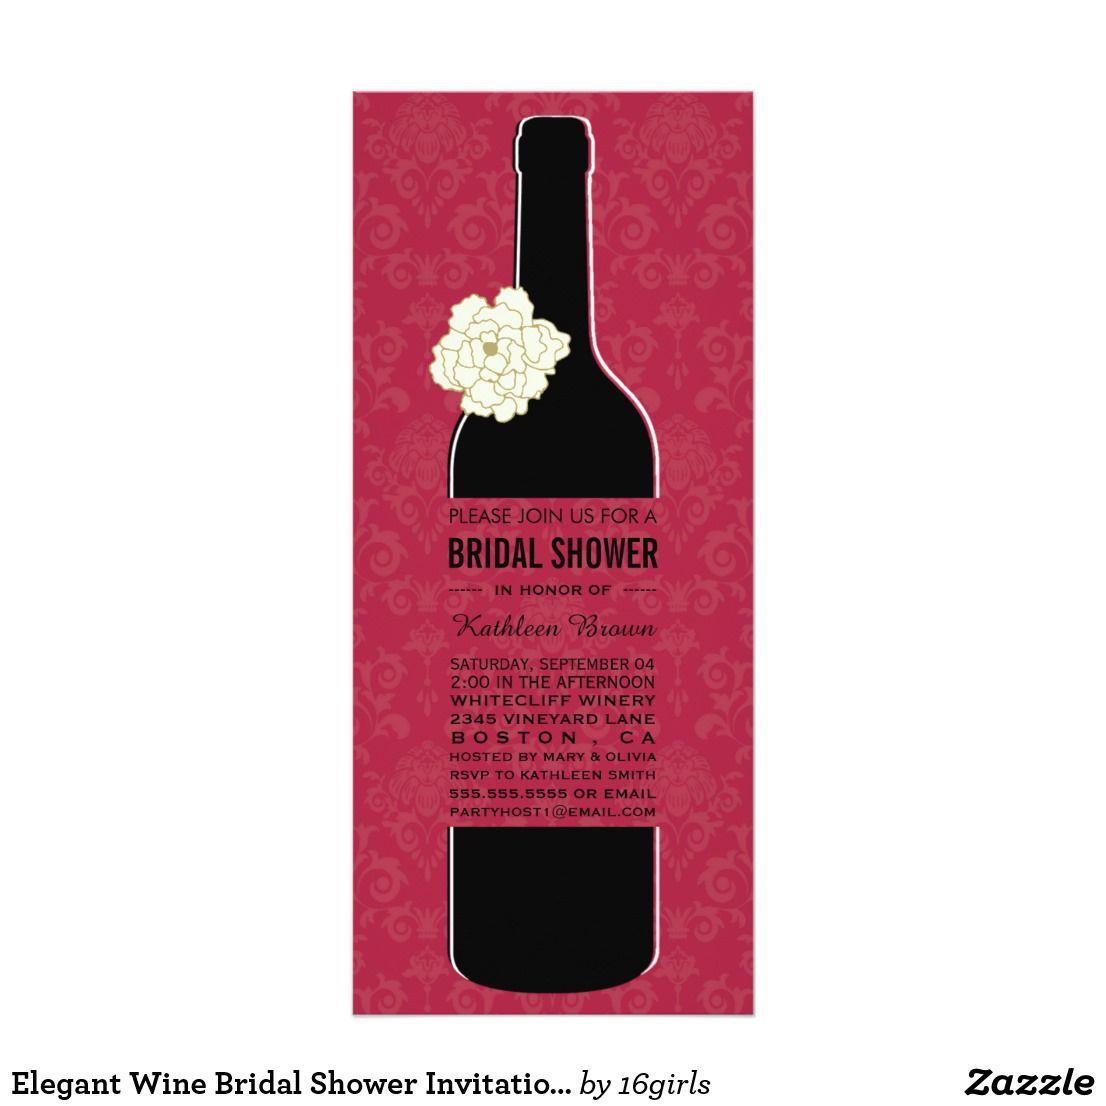 Elegant Wine Bridal Shower Invitations   Wine bridal showers, Shower ...